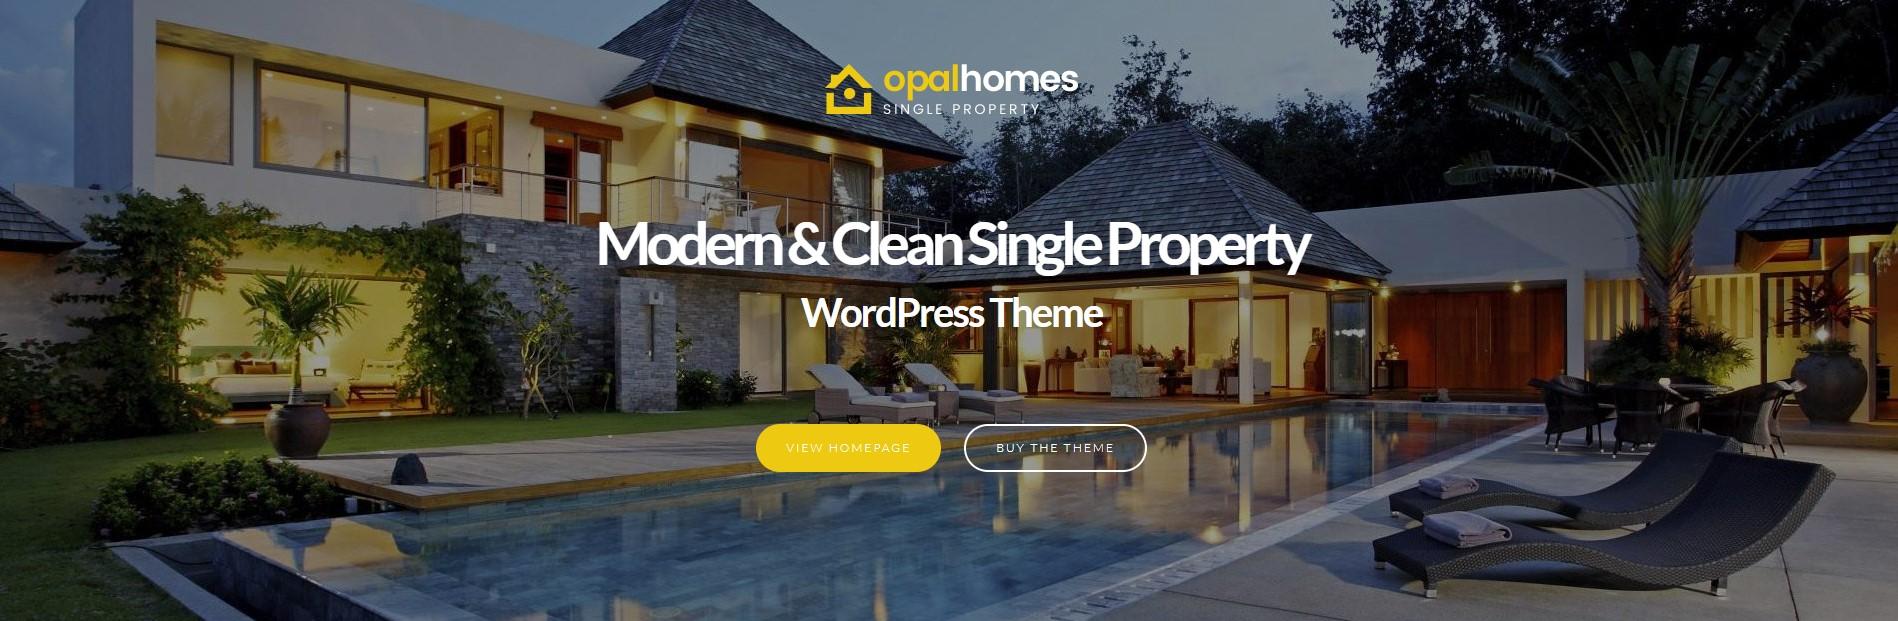 Opalhomes – Single Property WordPress Theme